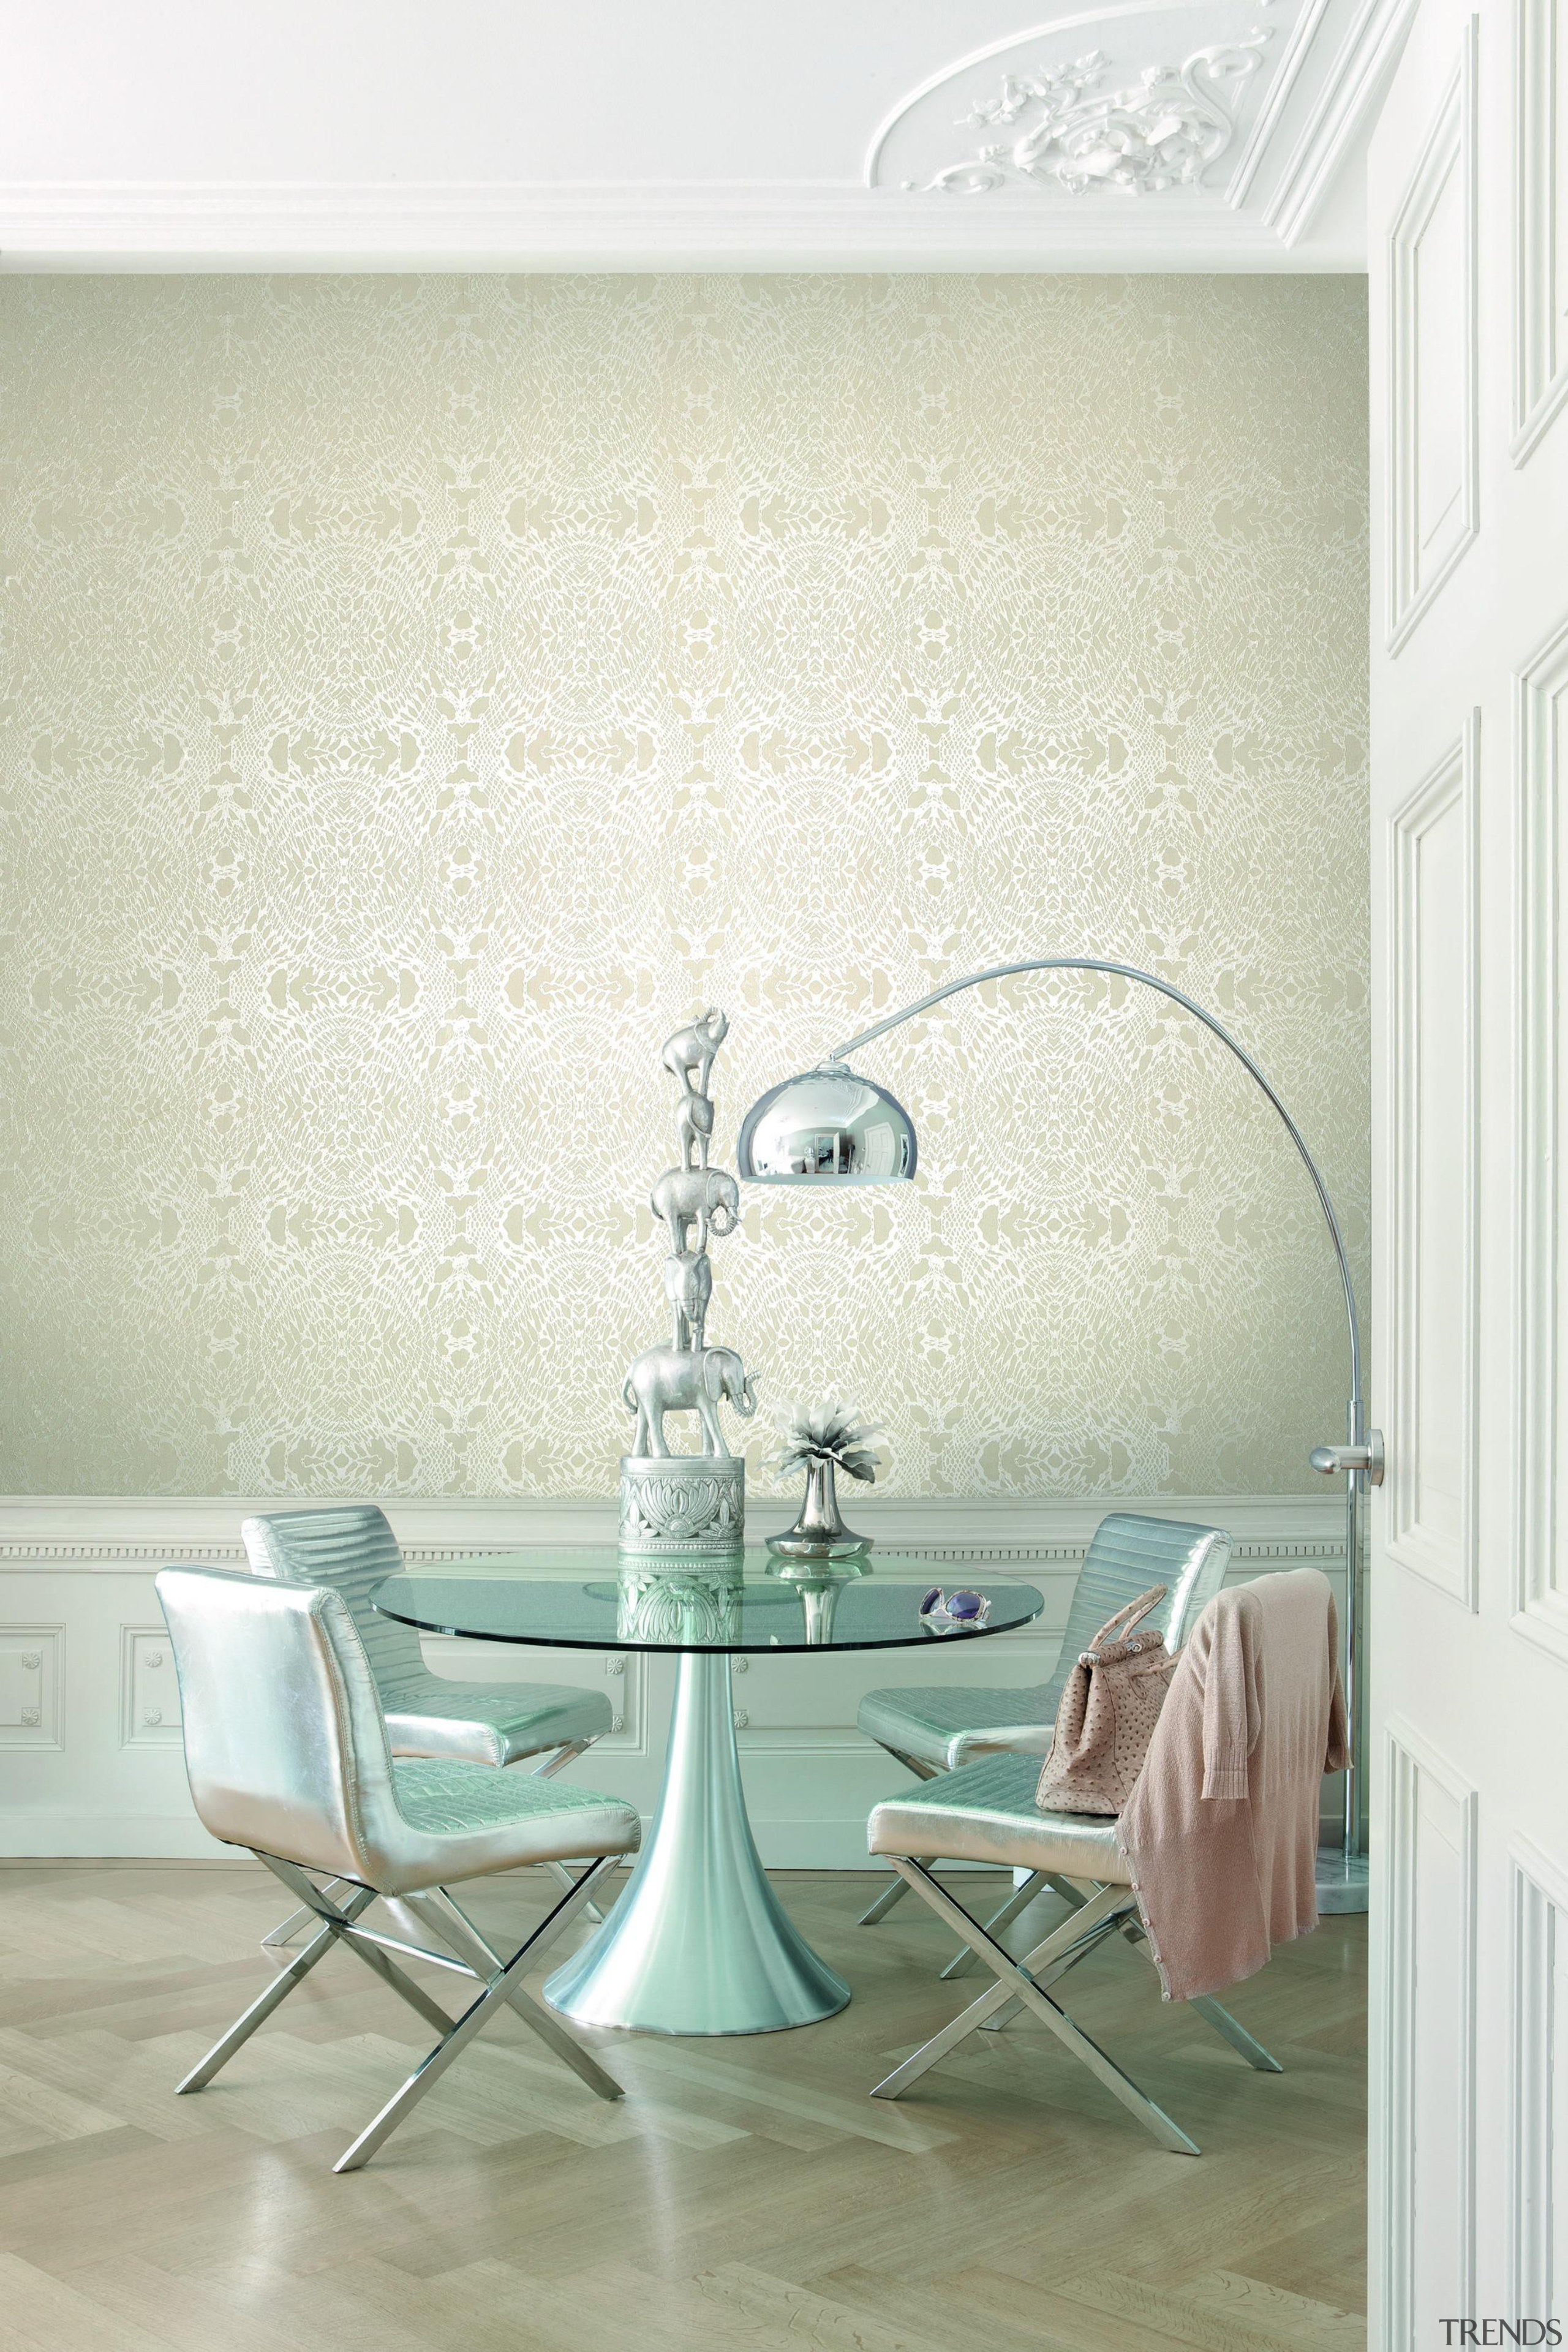 Hidden Richness Range - Hidden Richness Range - chair, floor, flooring, furniture, interior design, product design, room, table, tap, tile, wall, wallpaper, white